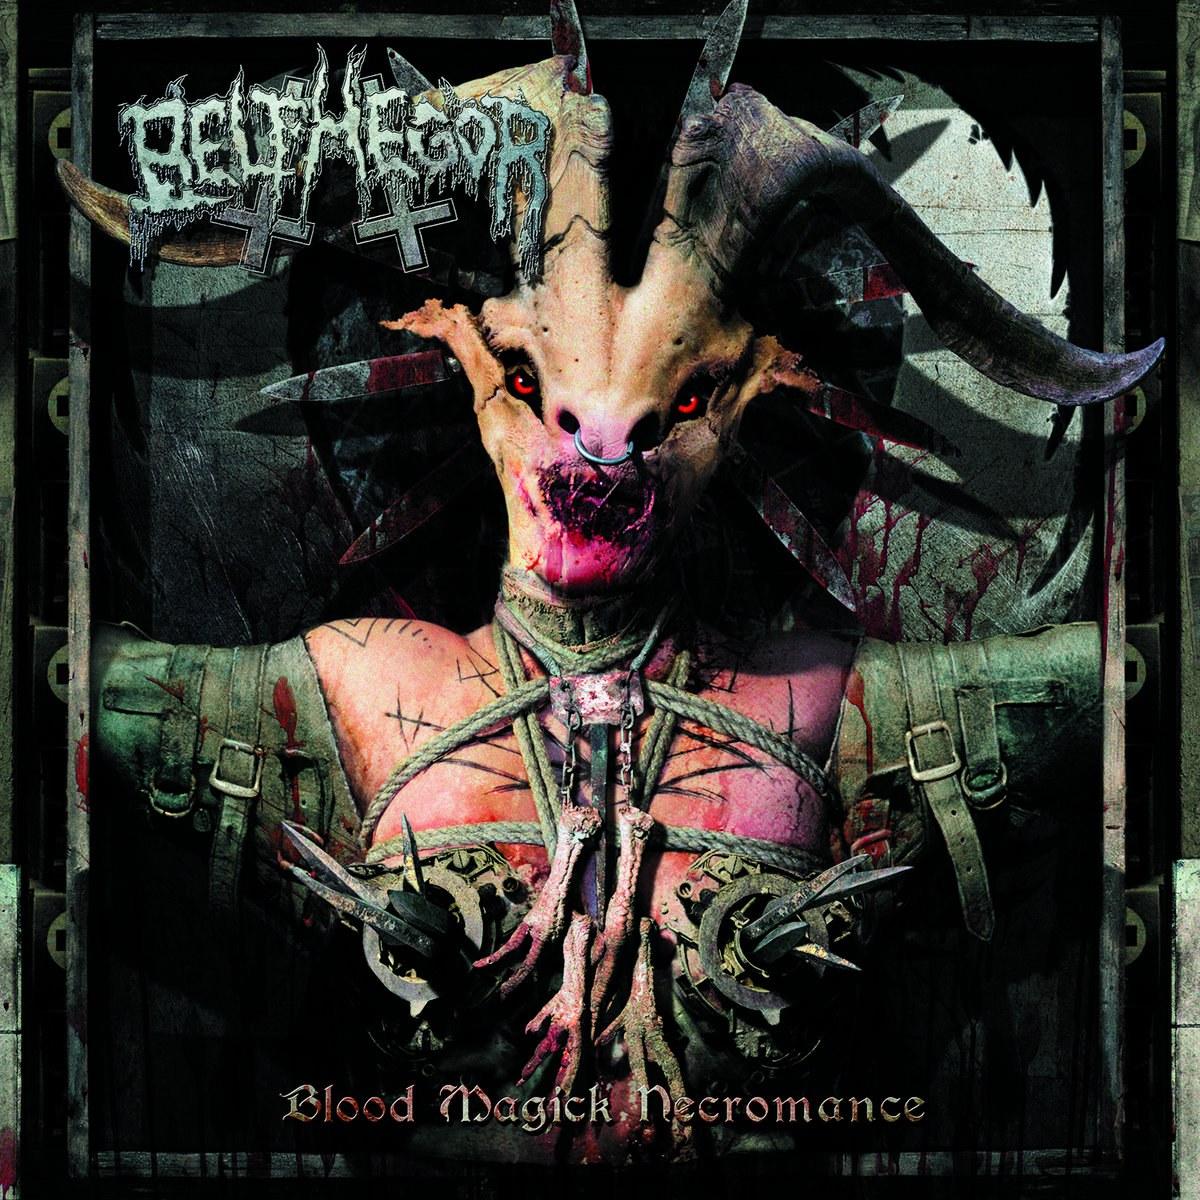 Reviews for Belphegor - Blood Magick Necromance